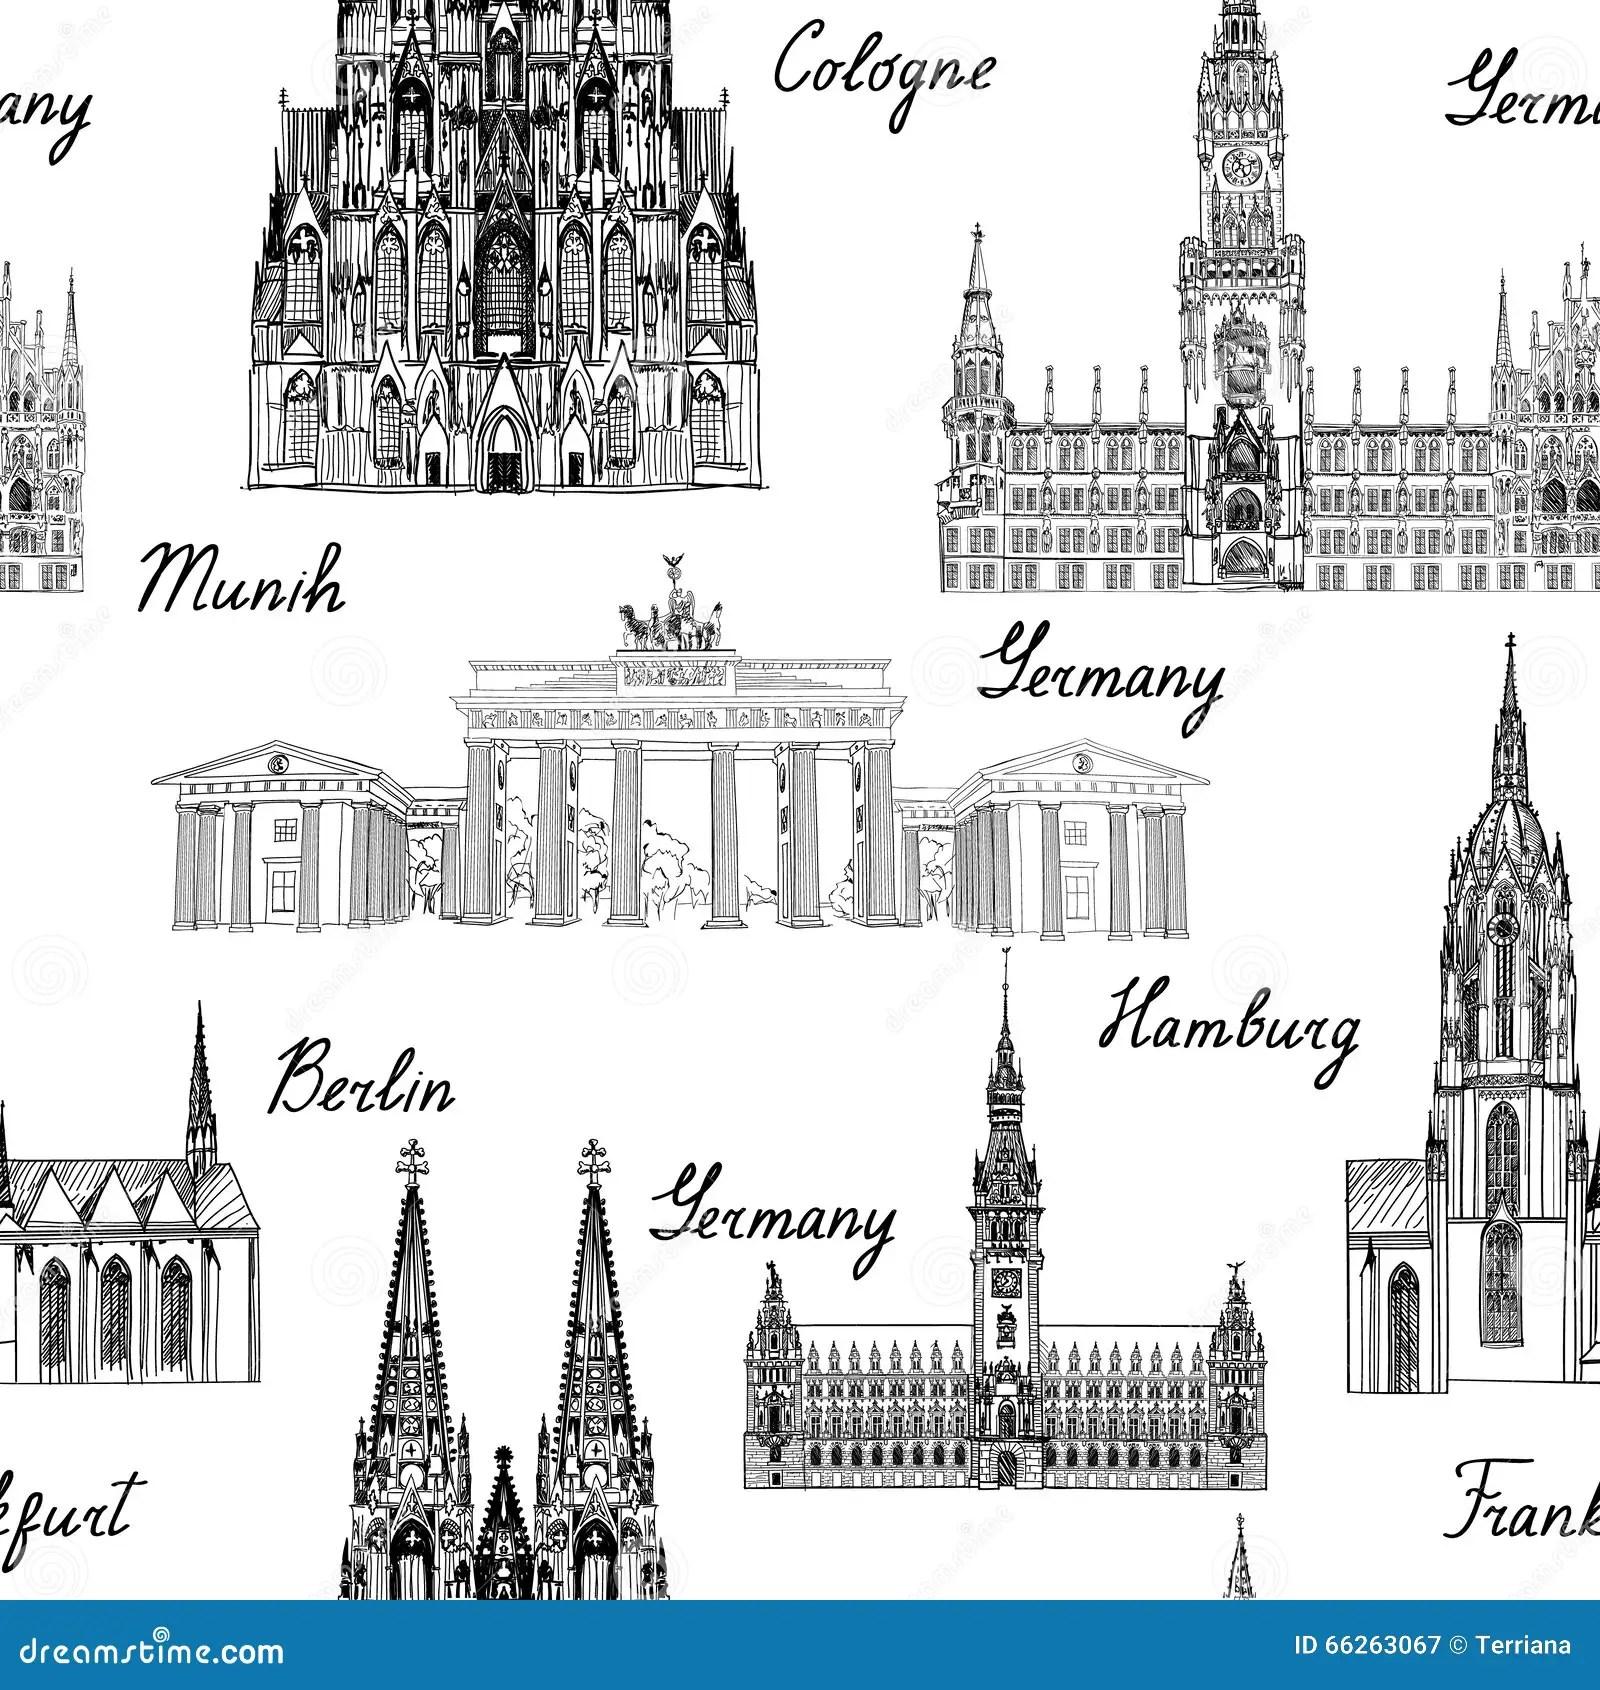 Cologne Skyline Emblem Cartoon Vector